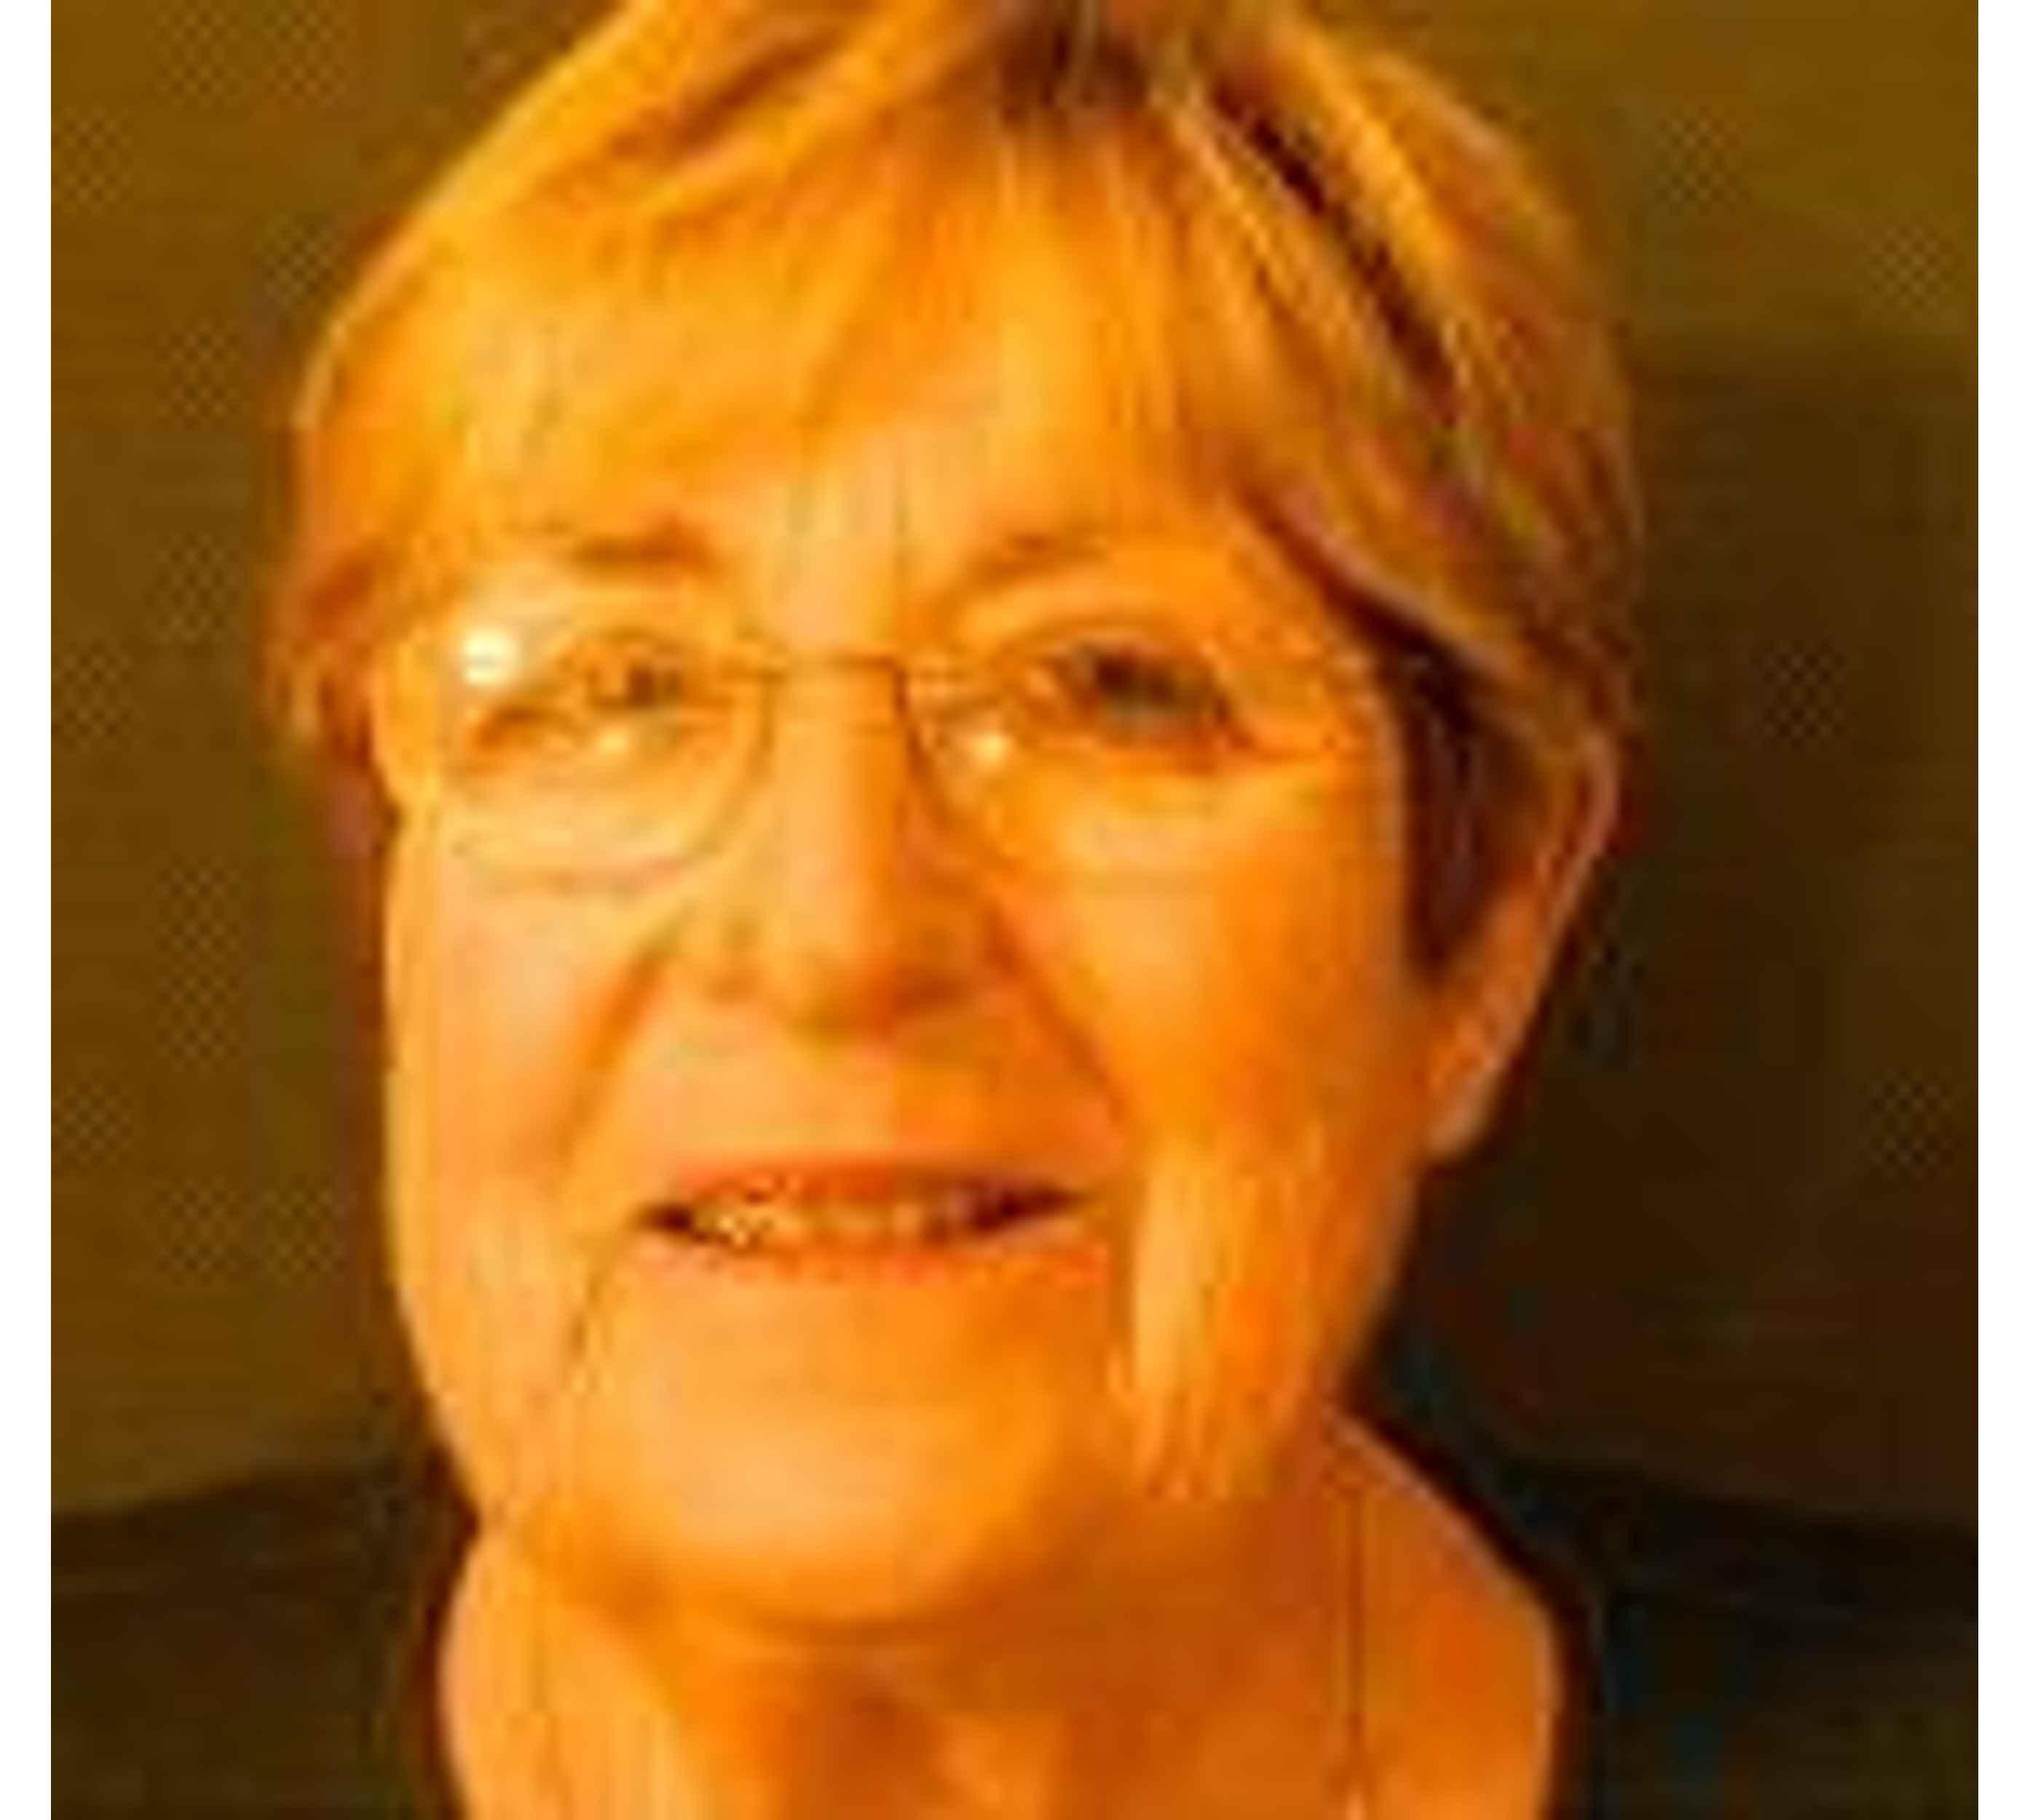 Dott.ssa Franca Grimaldi